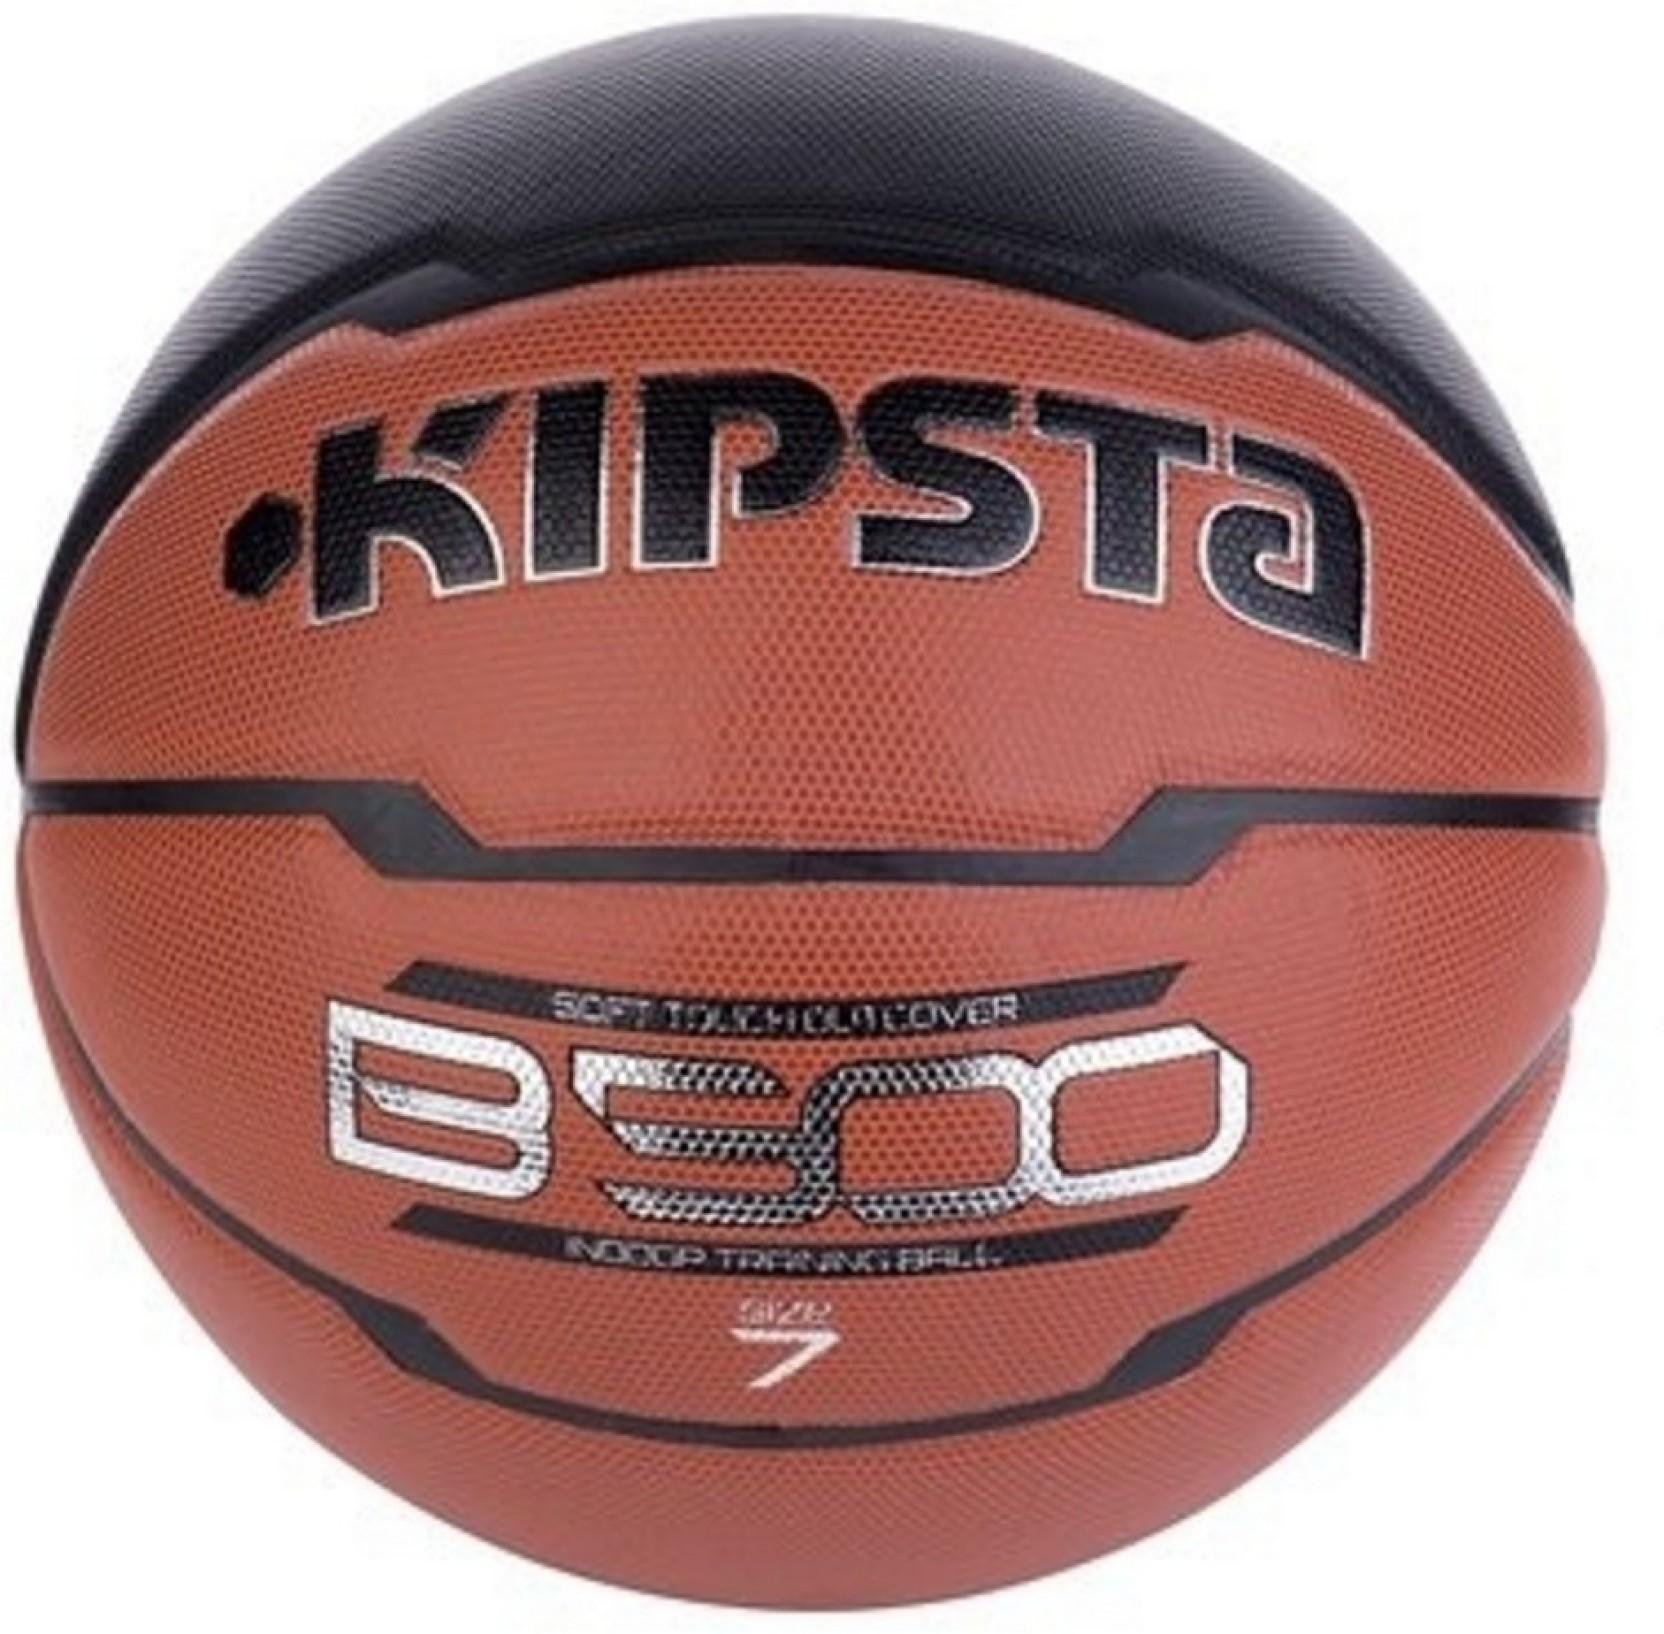 Kipsta decathlon basketball size pack of brown black jpg 1664x1634 Kipsta  basketball f238dacbca1c